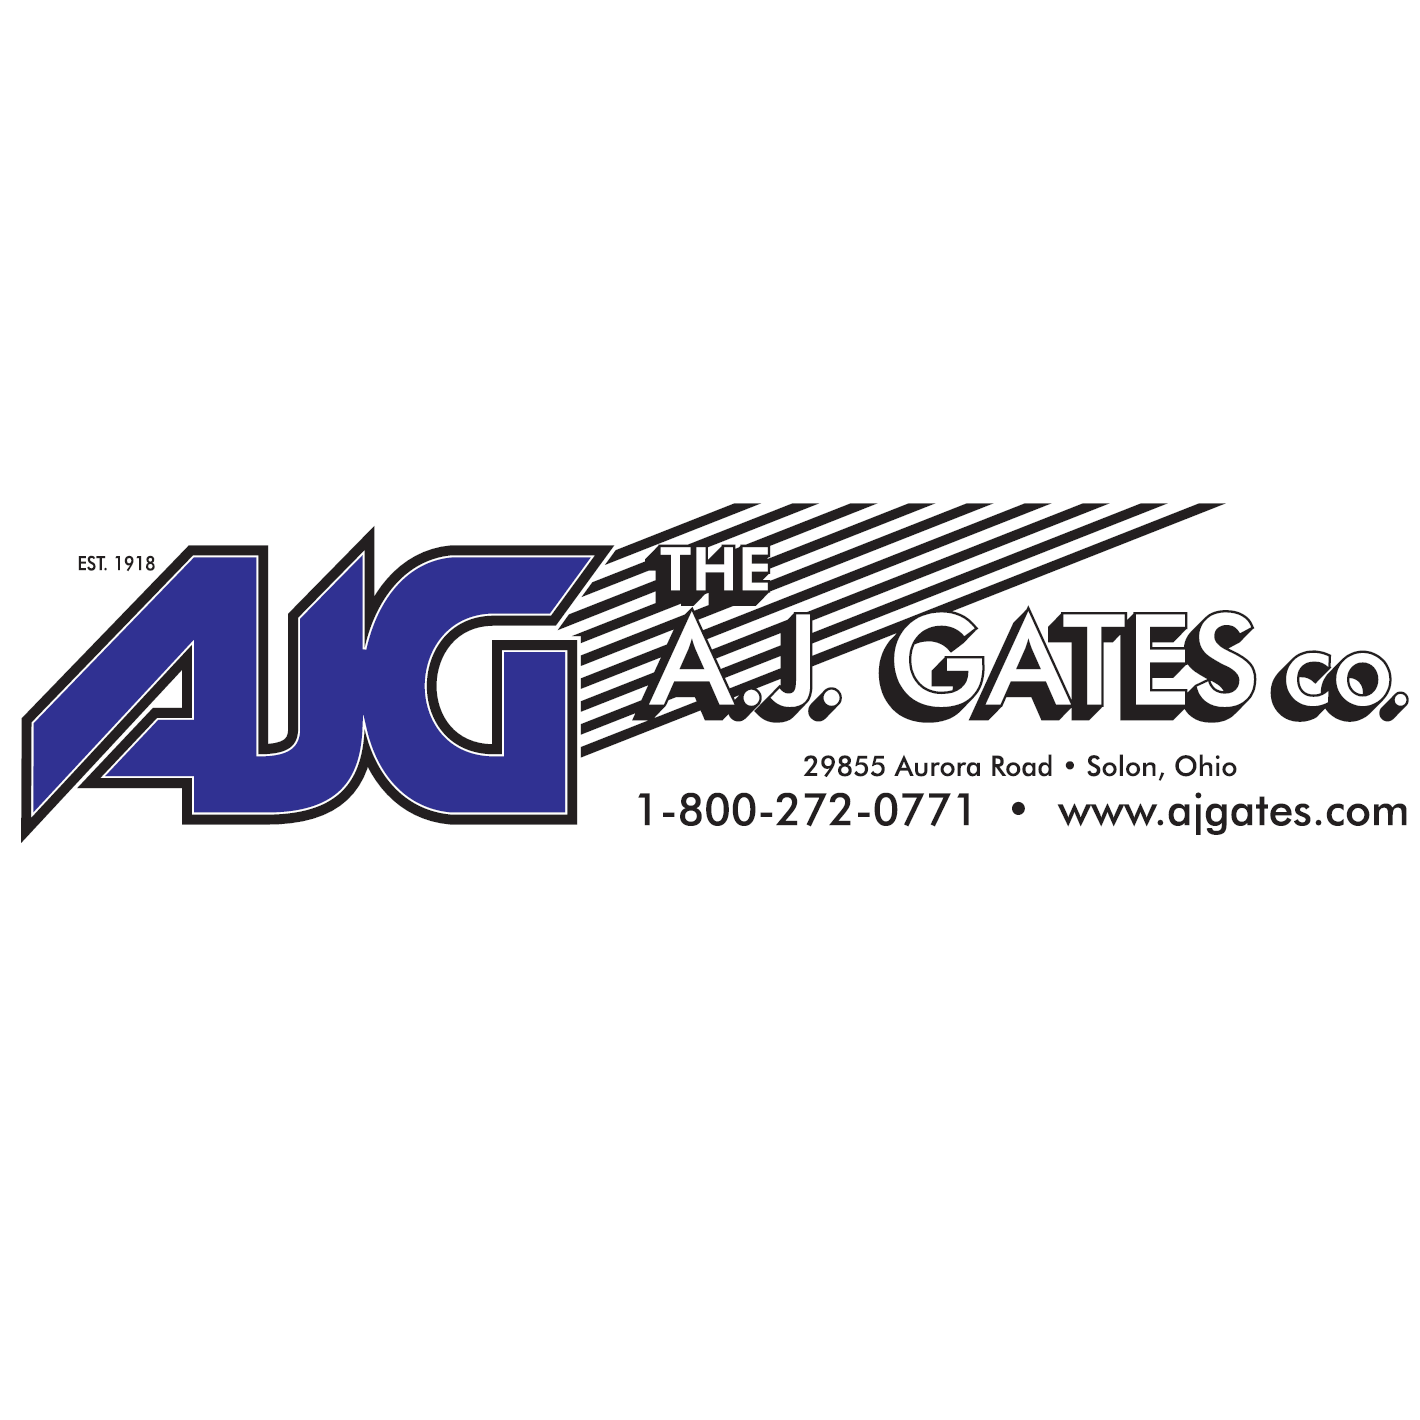 The A.J. Gates Company